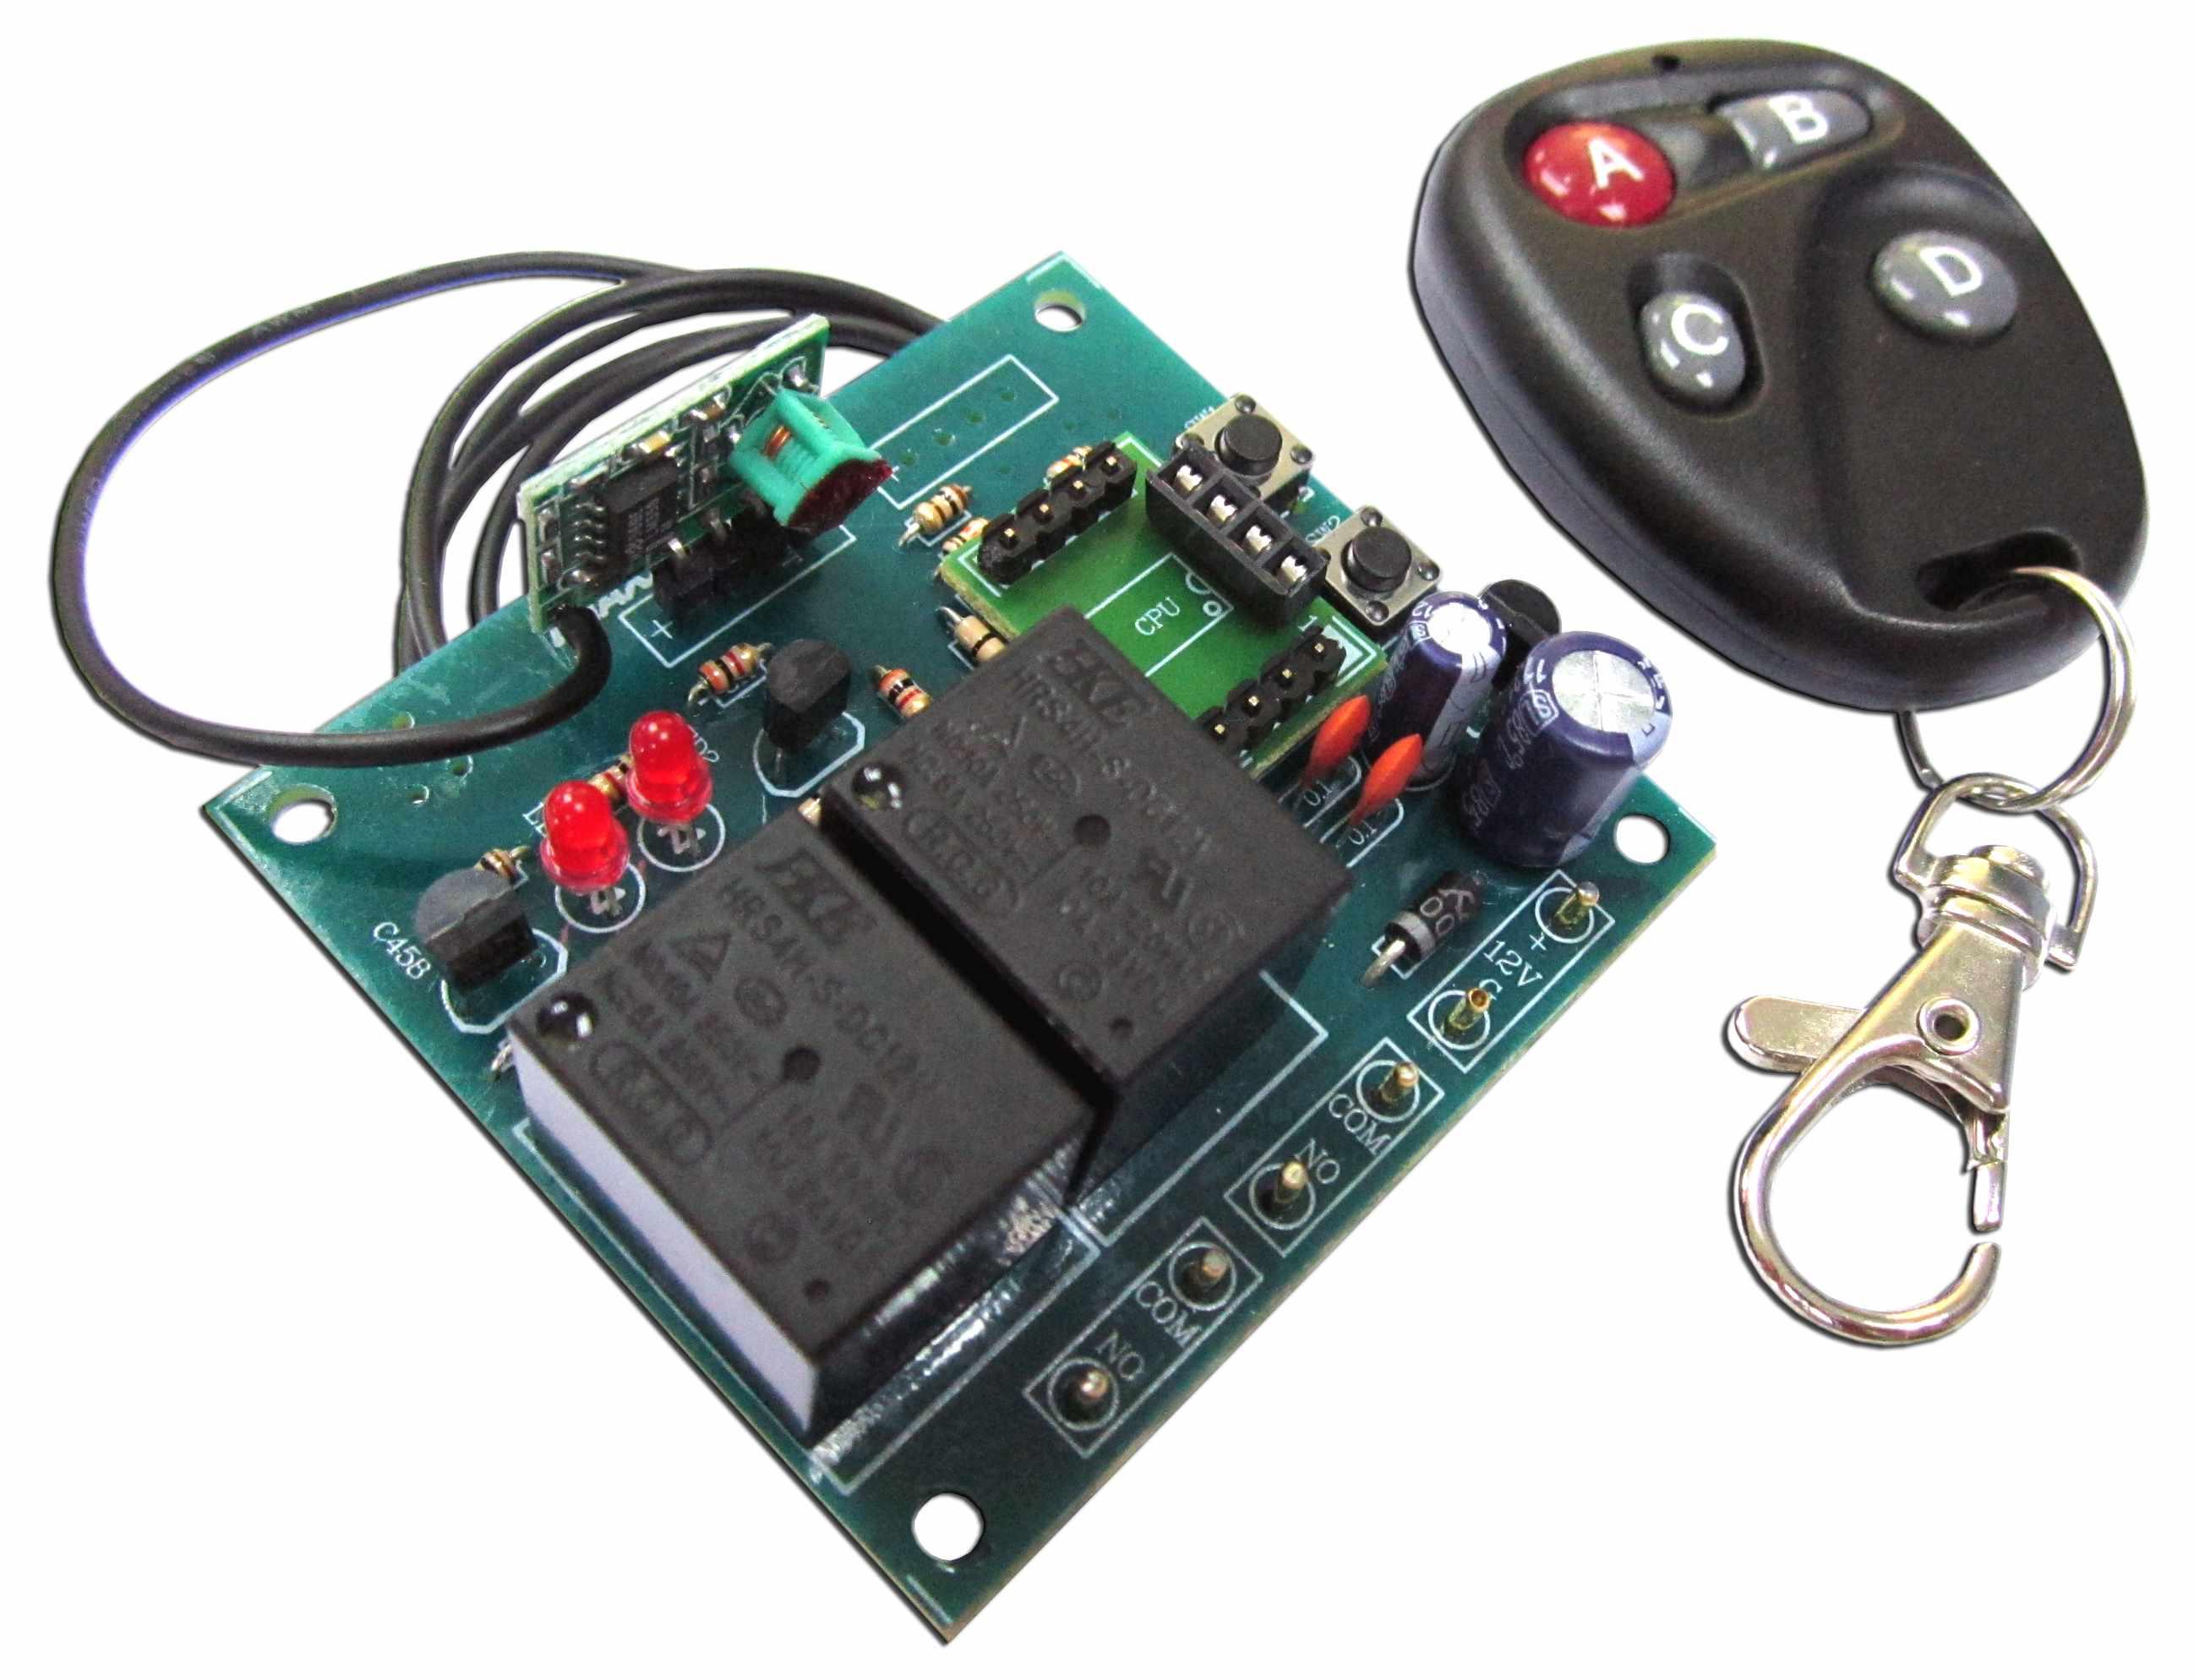 MXA107 2 Channel UHF Remote Control